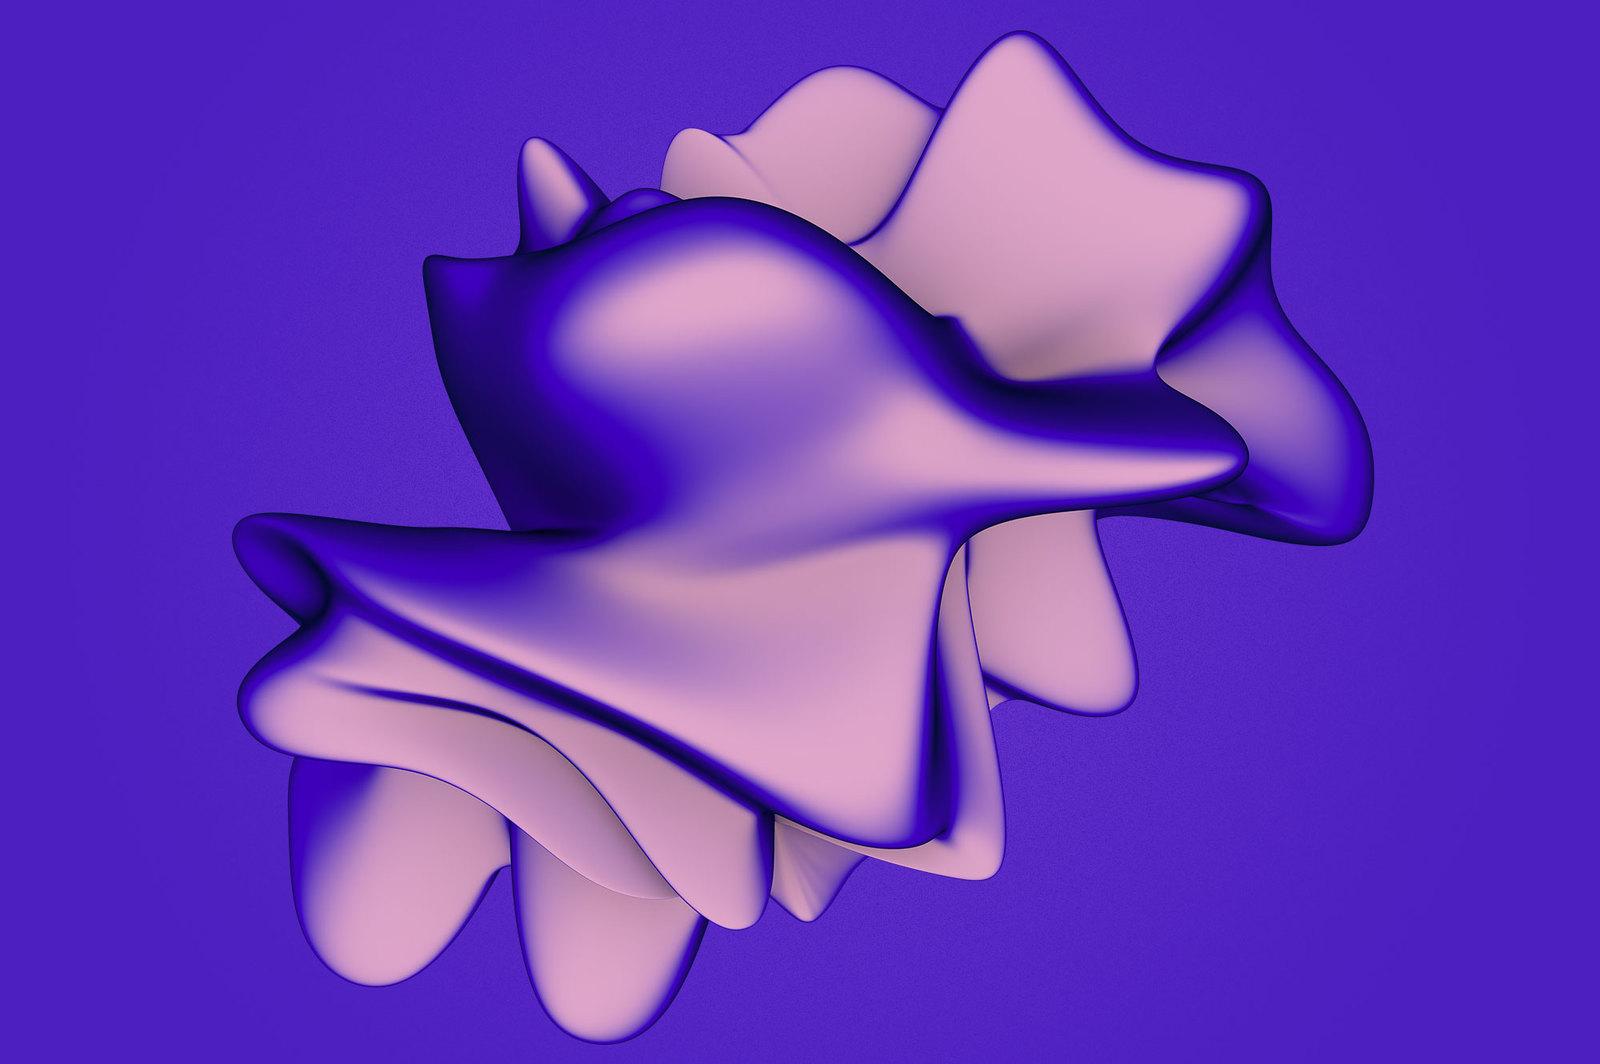 Amorphous: 15 Experimental 3D Shapes